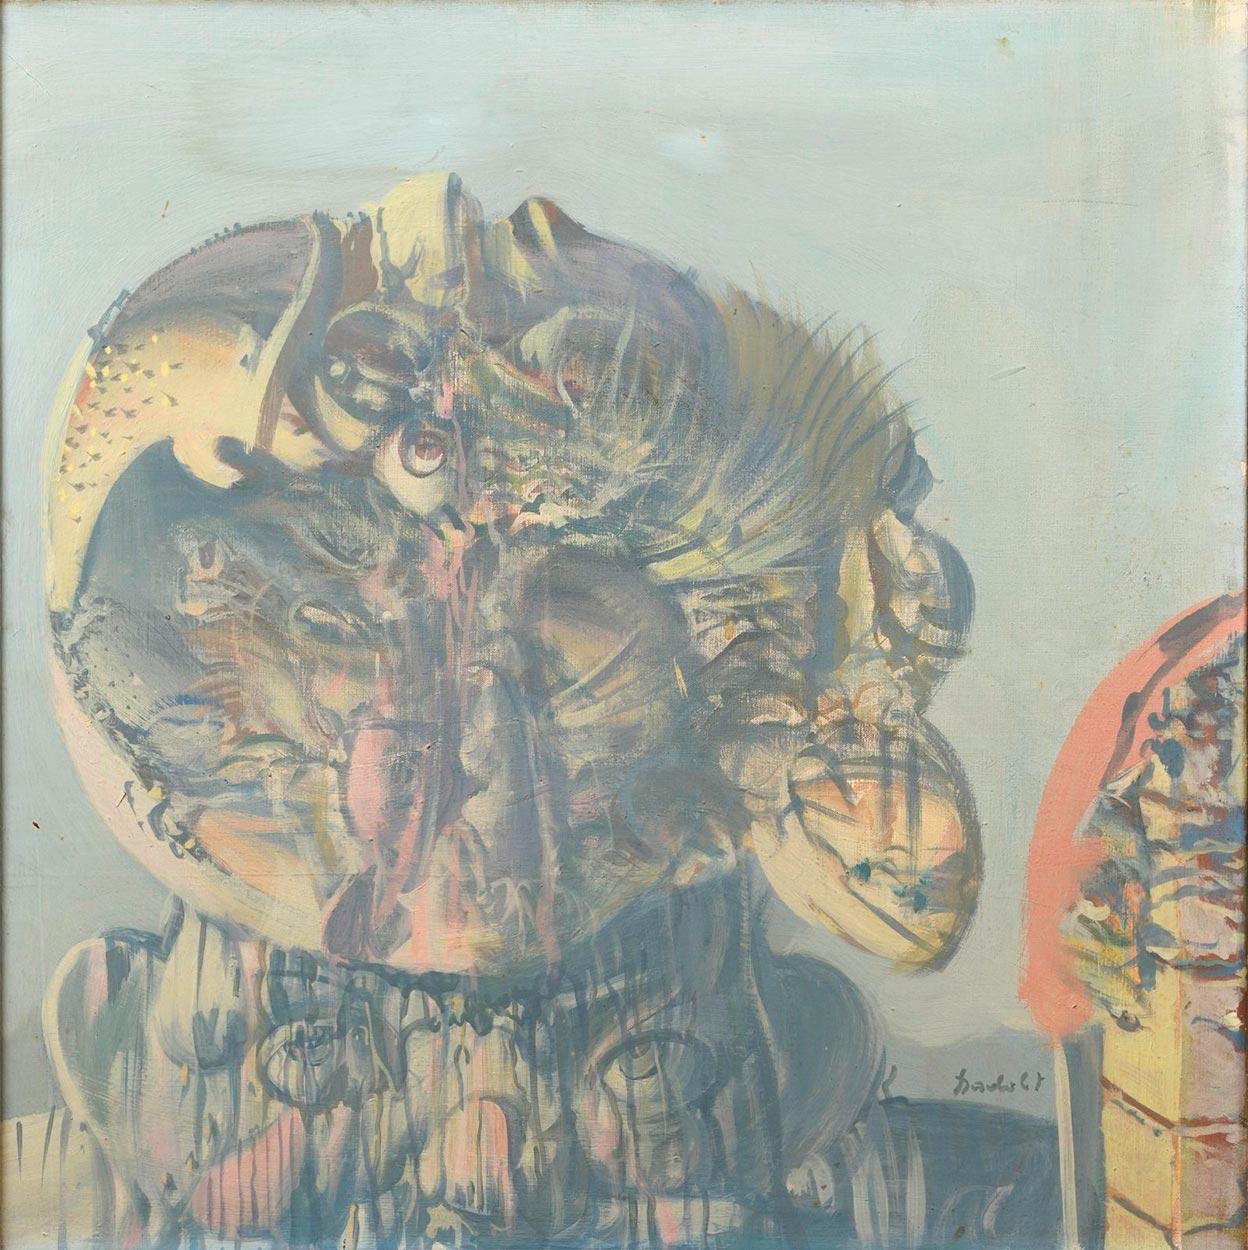 Dado's painting: The Gallery of Ancestors XXII, 1969